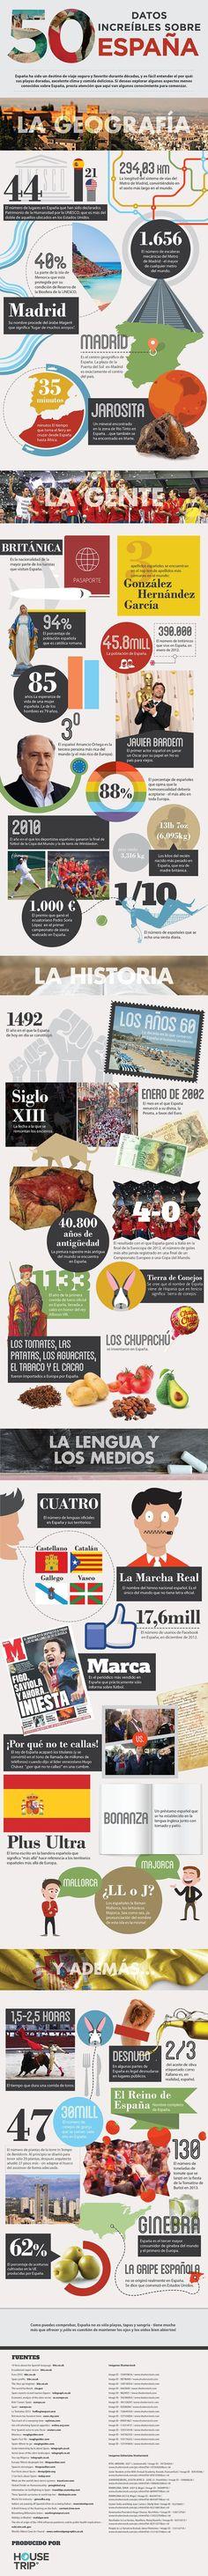 "50 cosas por las que España ""is different"" (Infografía de HouseTrip.es vía The Huffington Post)."